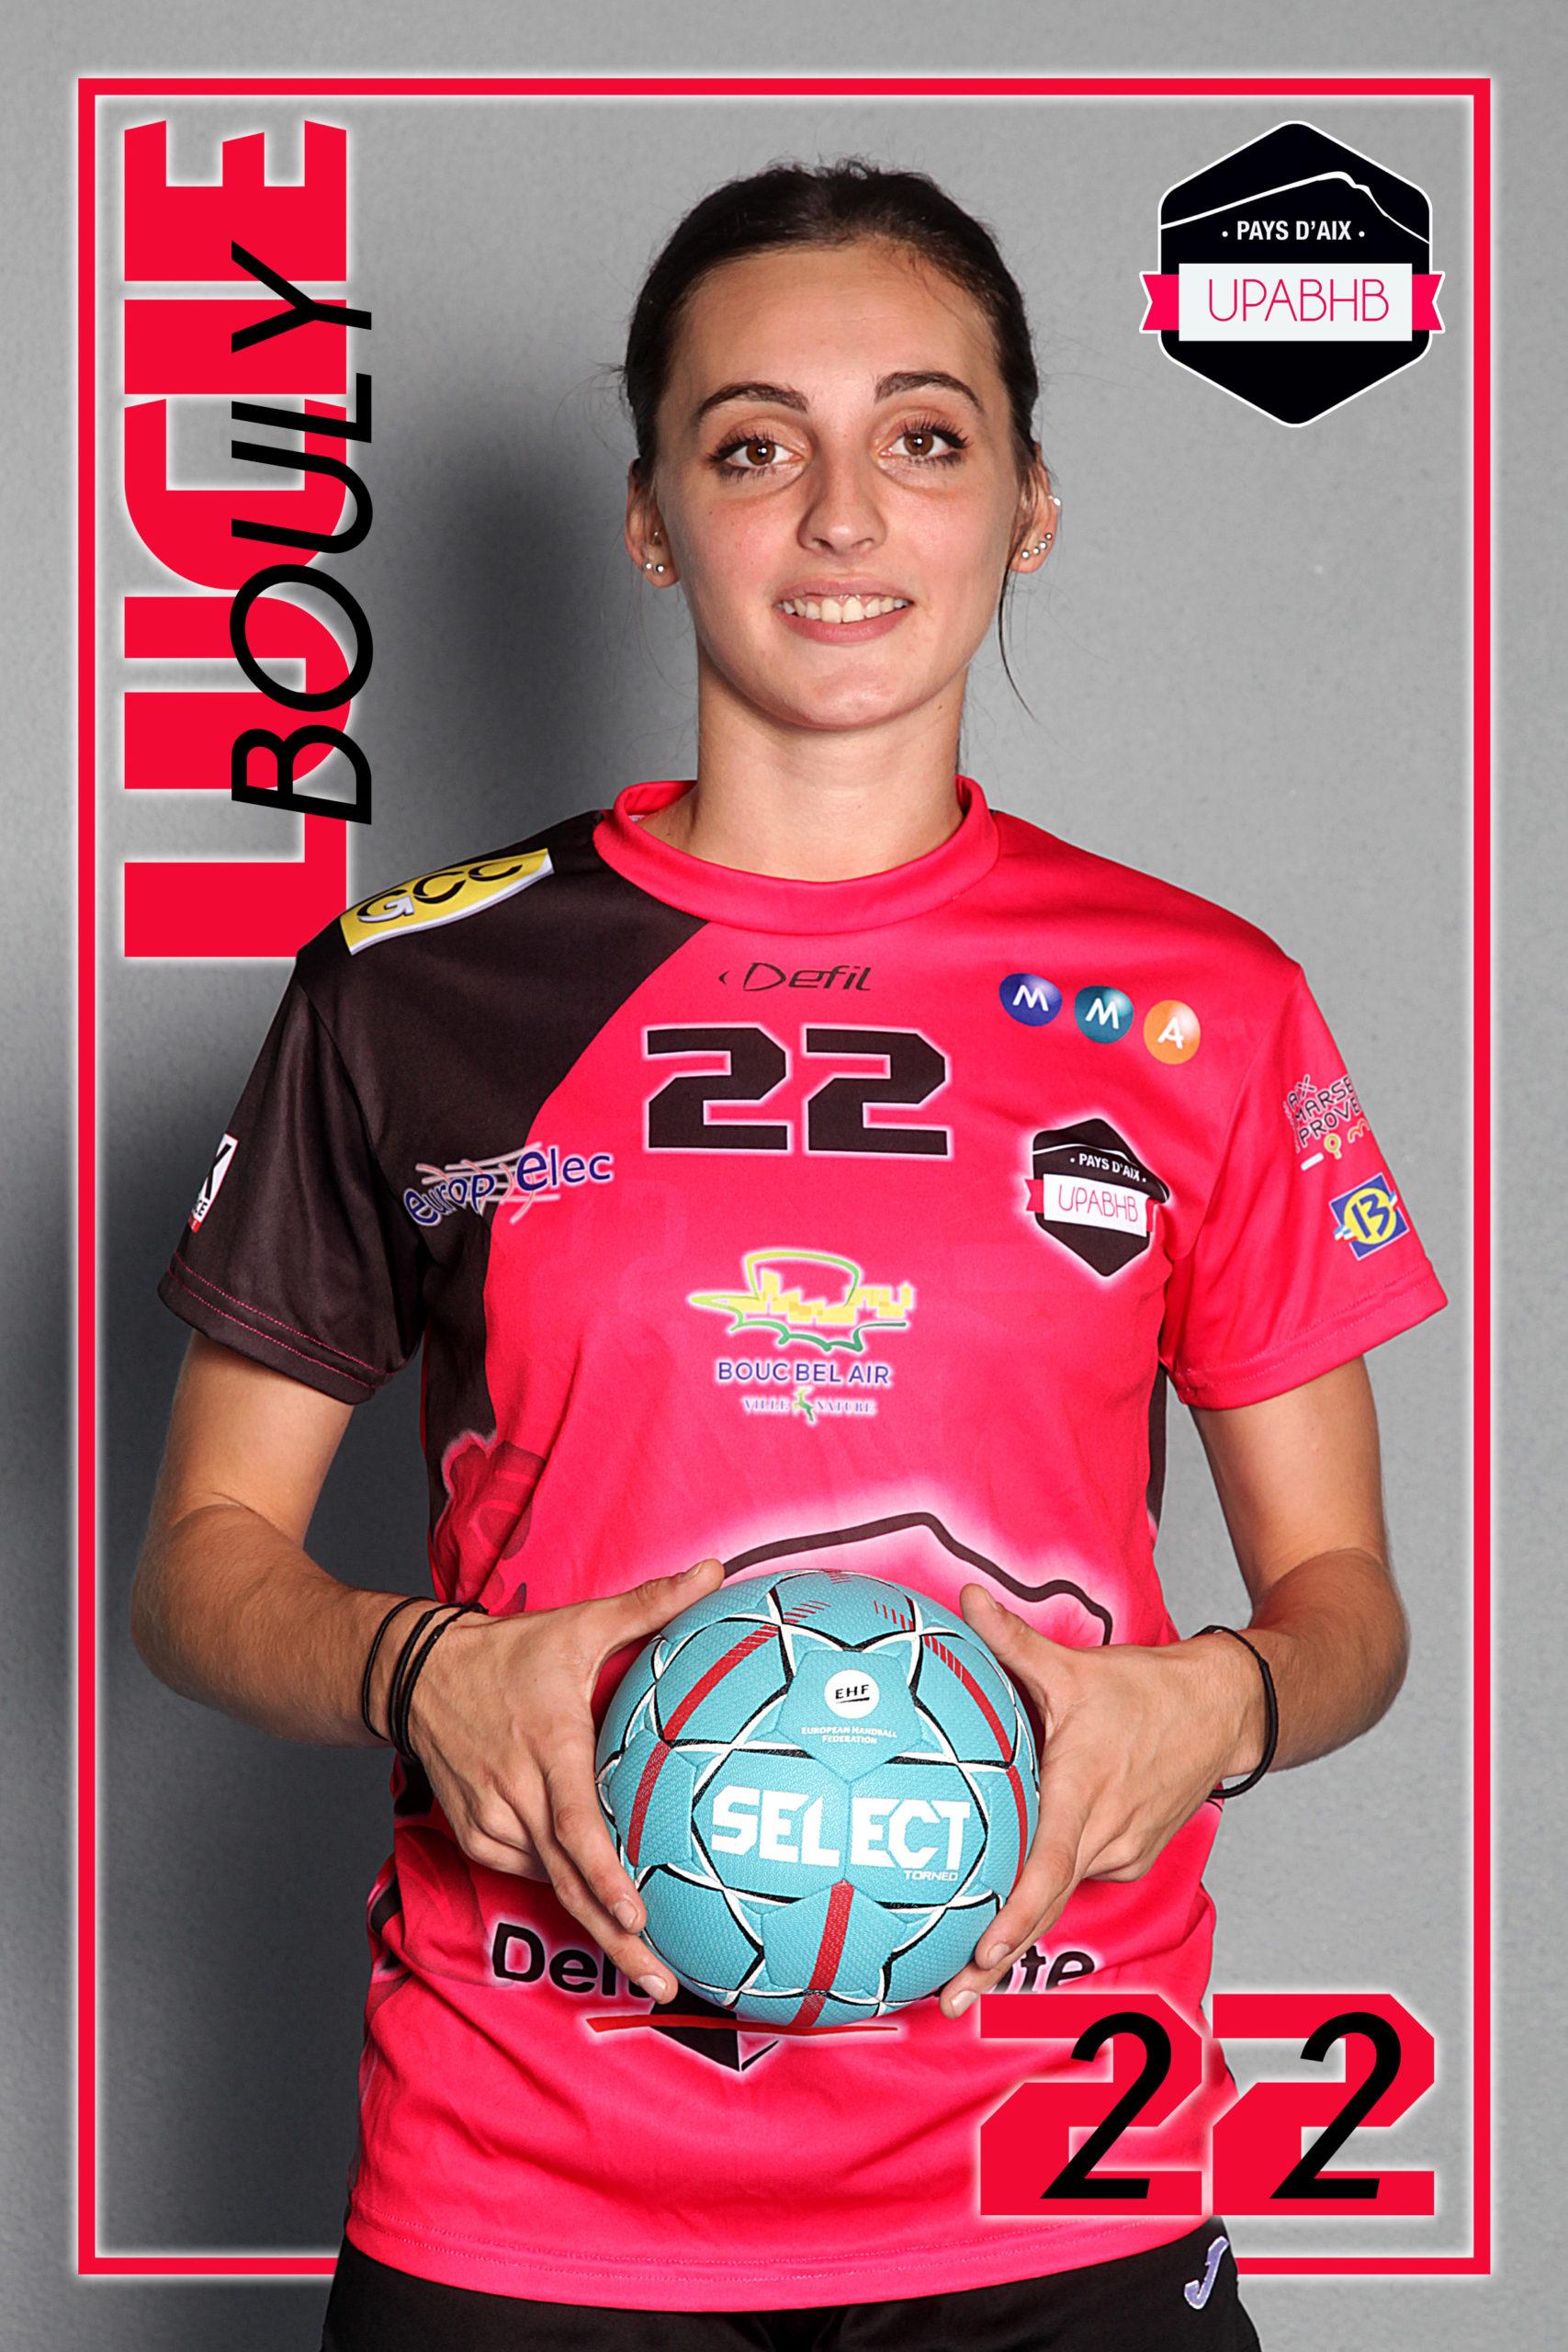 Lucie Bouly UPABHB